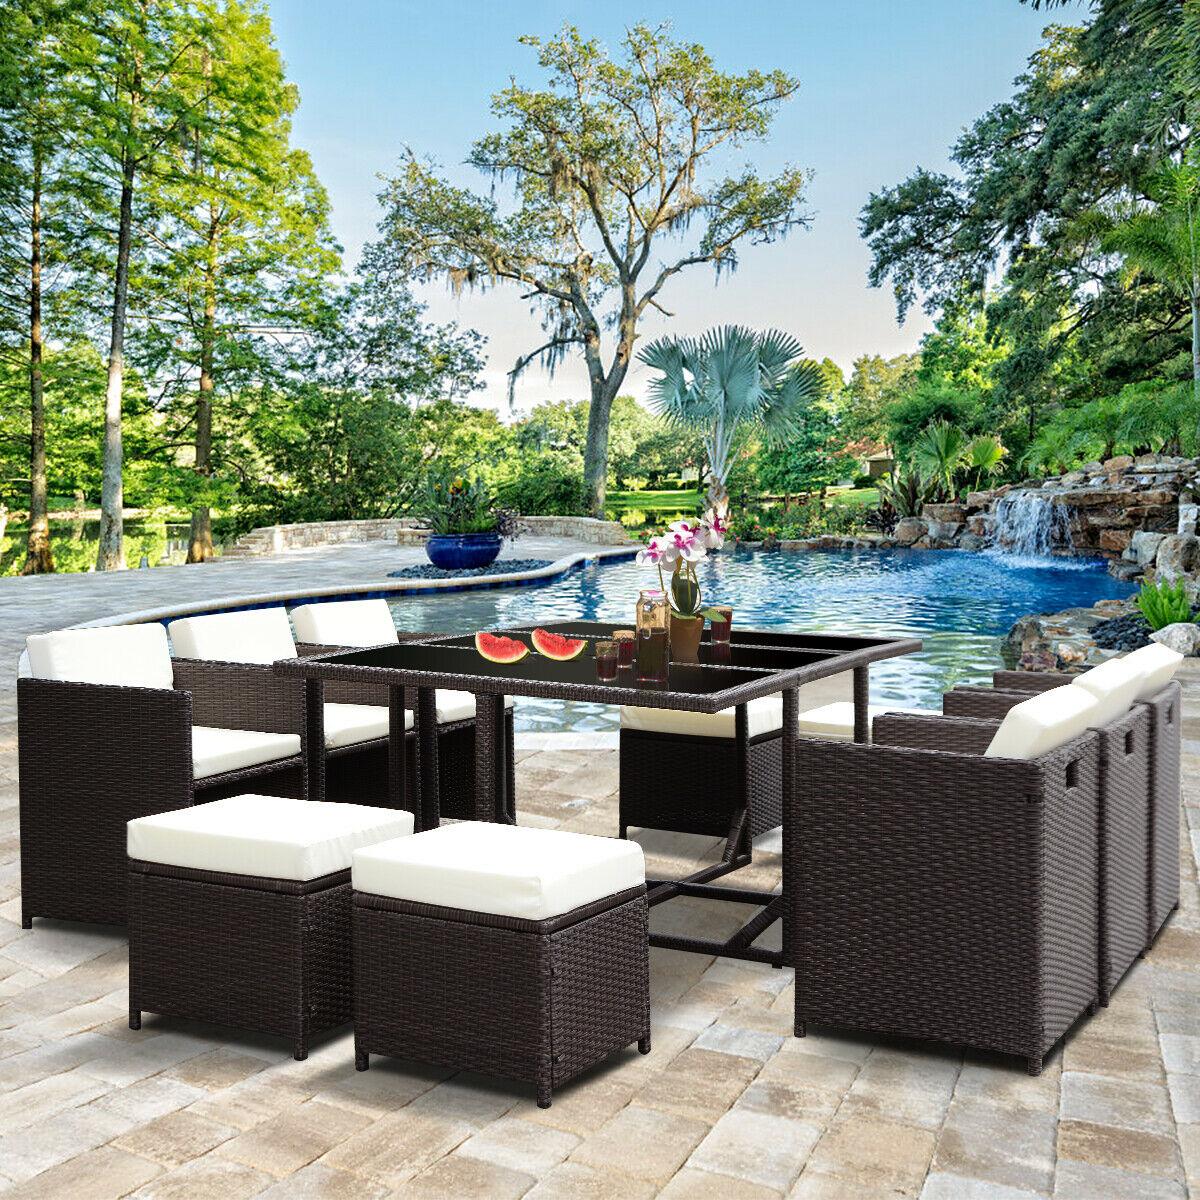 Costway 11 PCS Outdoor Patio Dining Set Metal Rattan Wicker Furniture Garden Cushioned